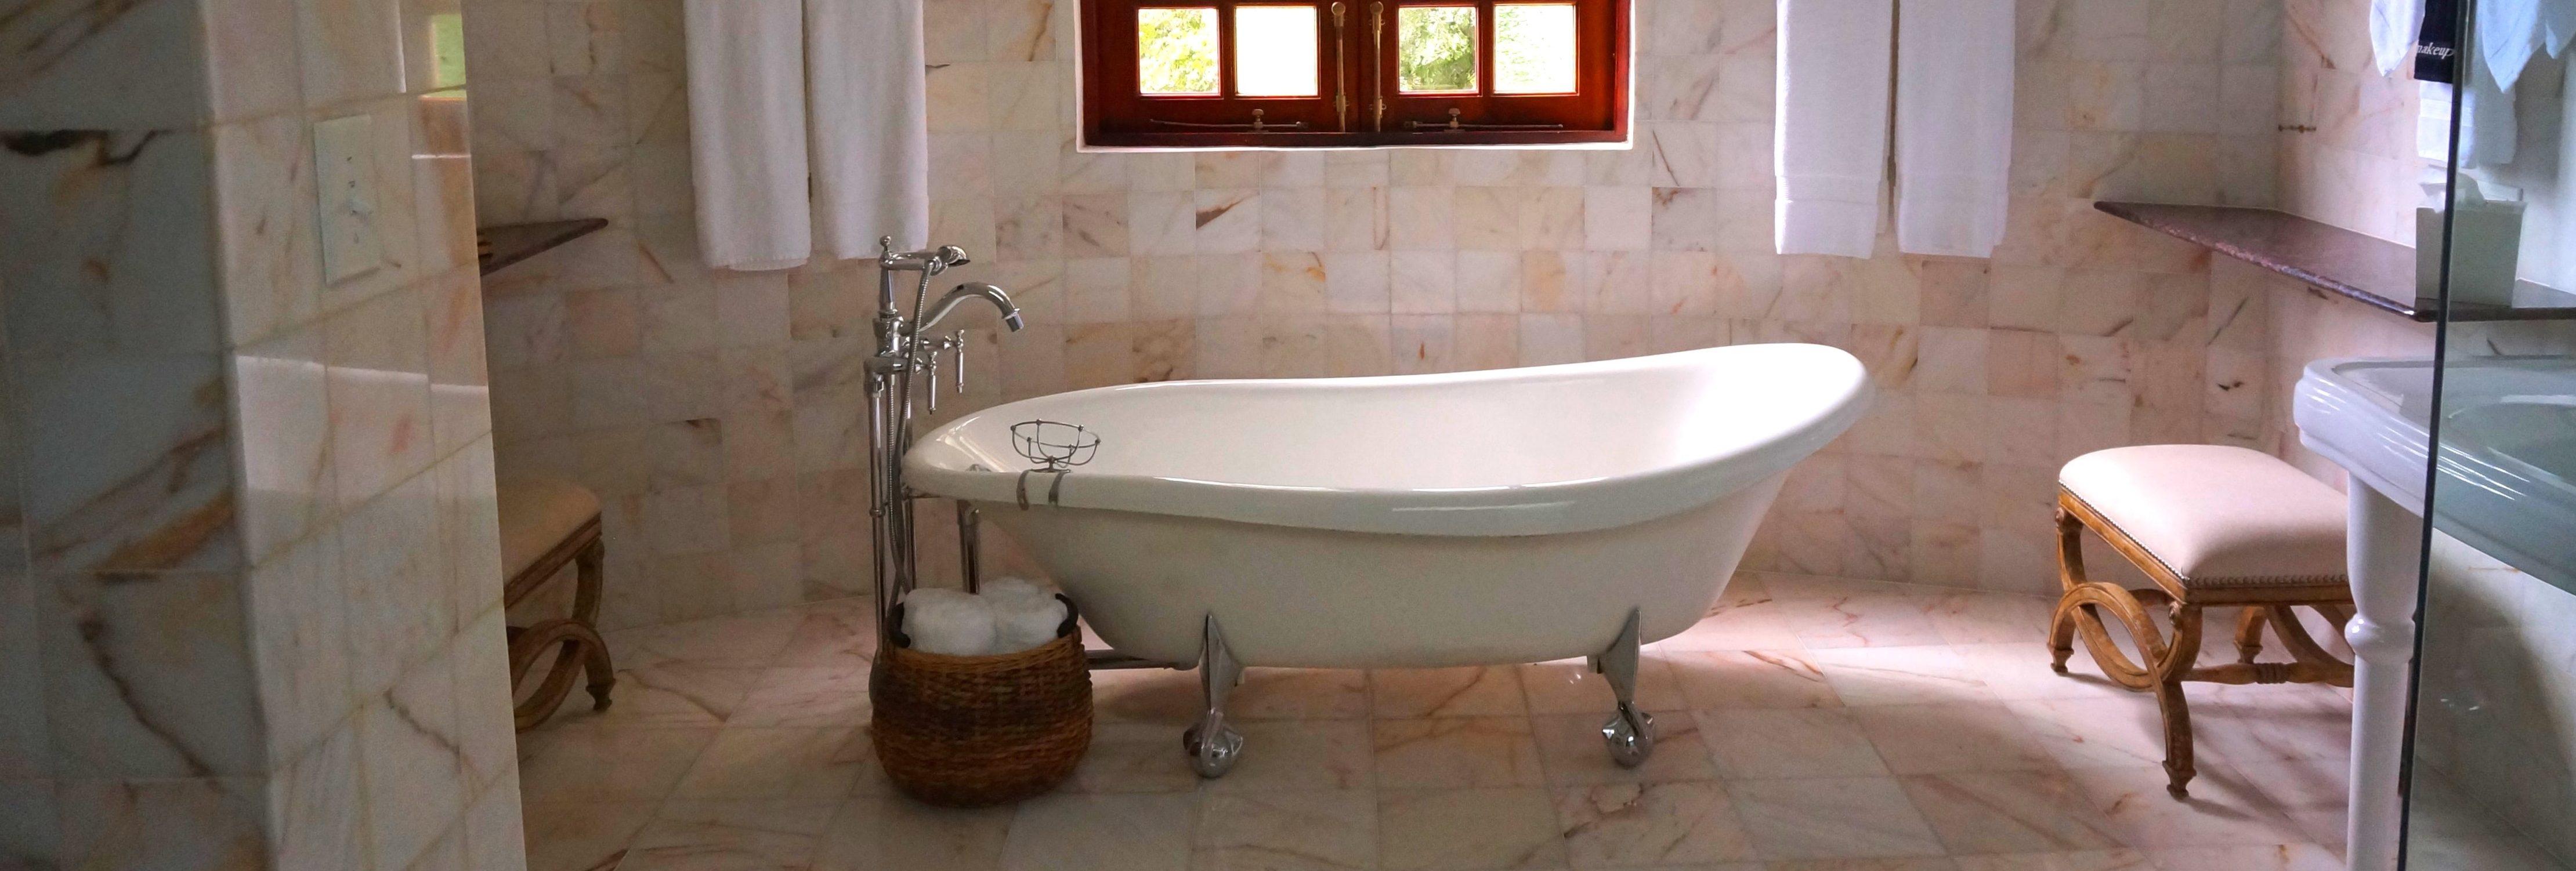 dream bathroom renovation